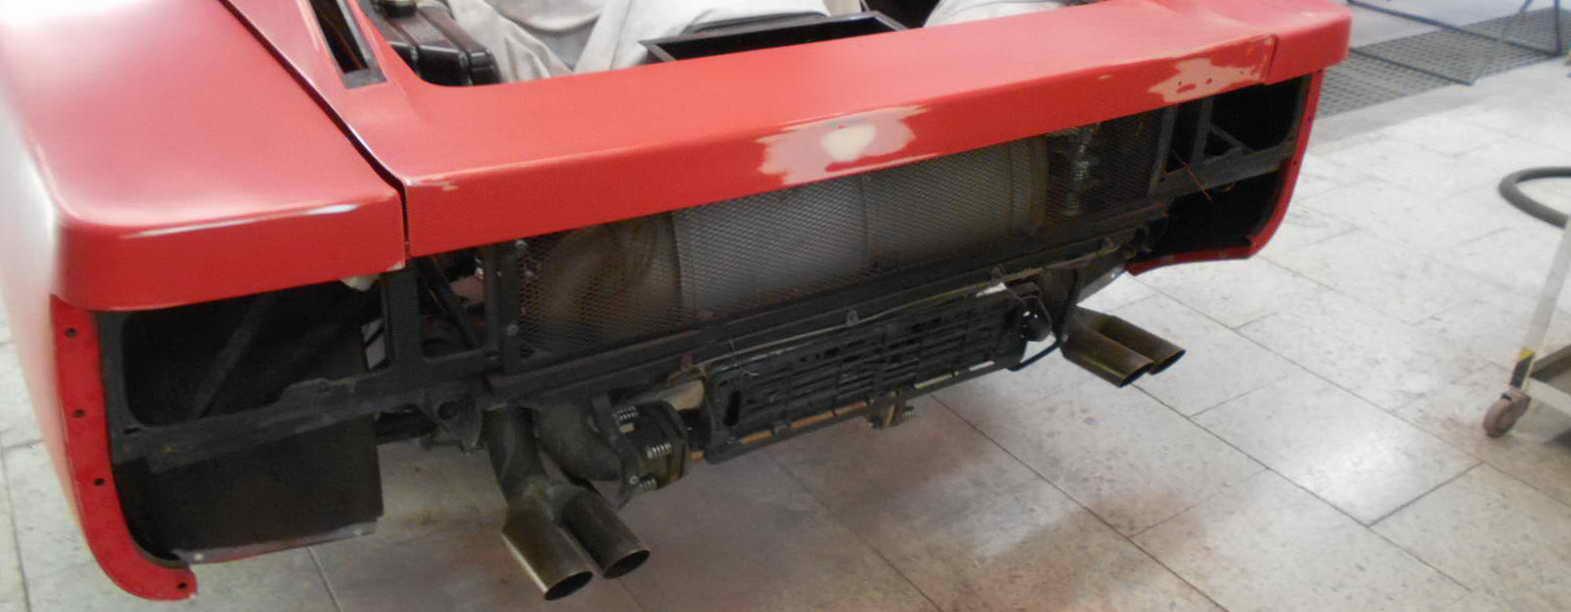 Ferrari Testarosssa restoration banner 3